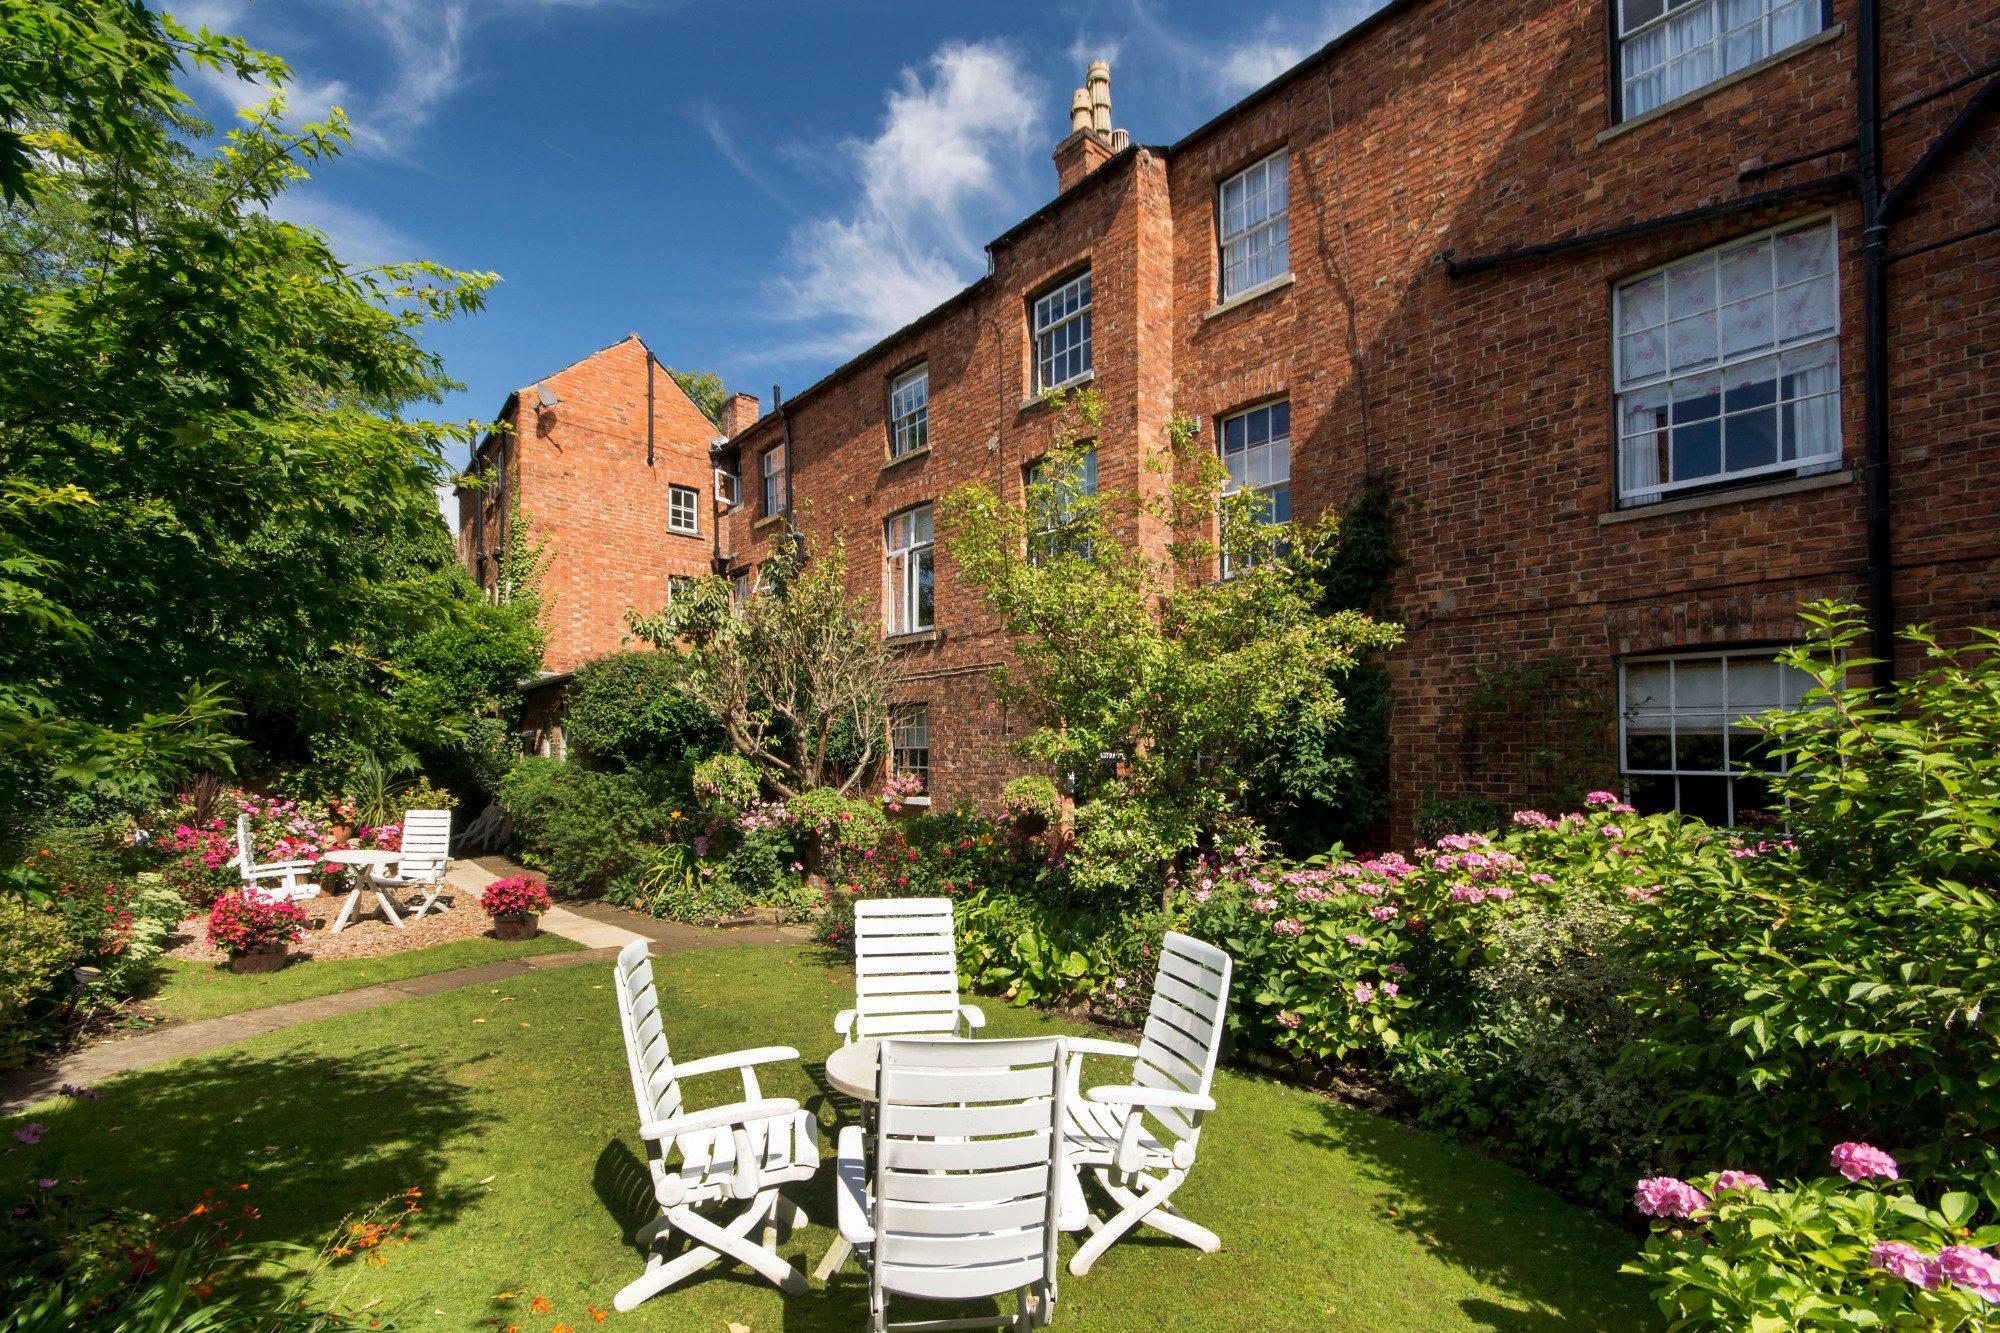 The Garden Hotel, Uppingham